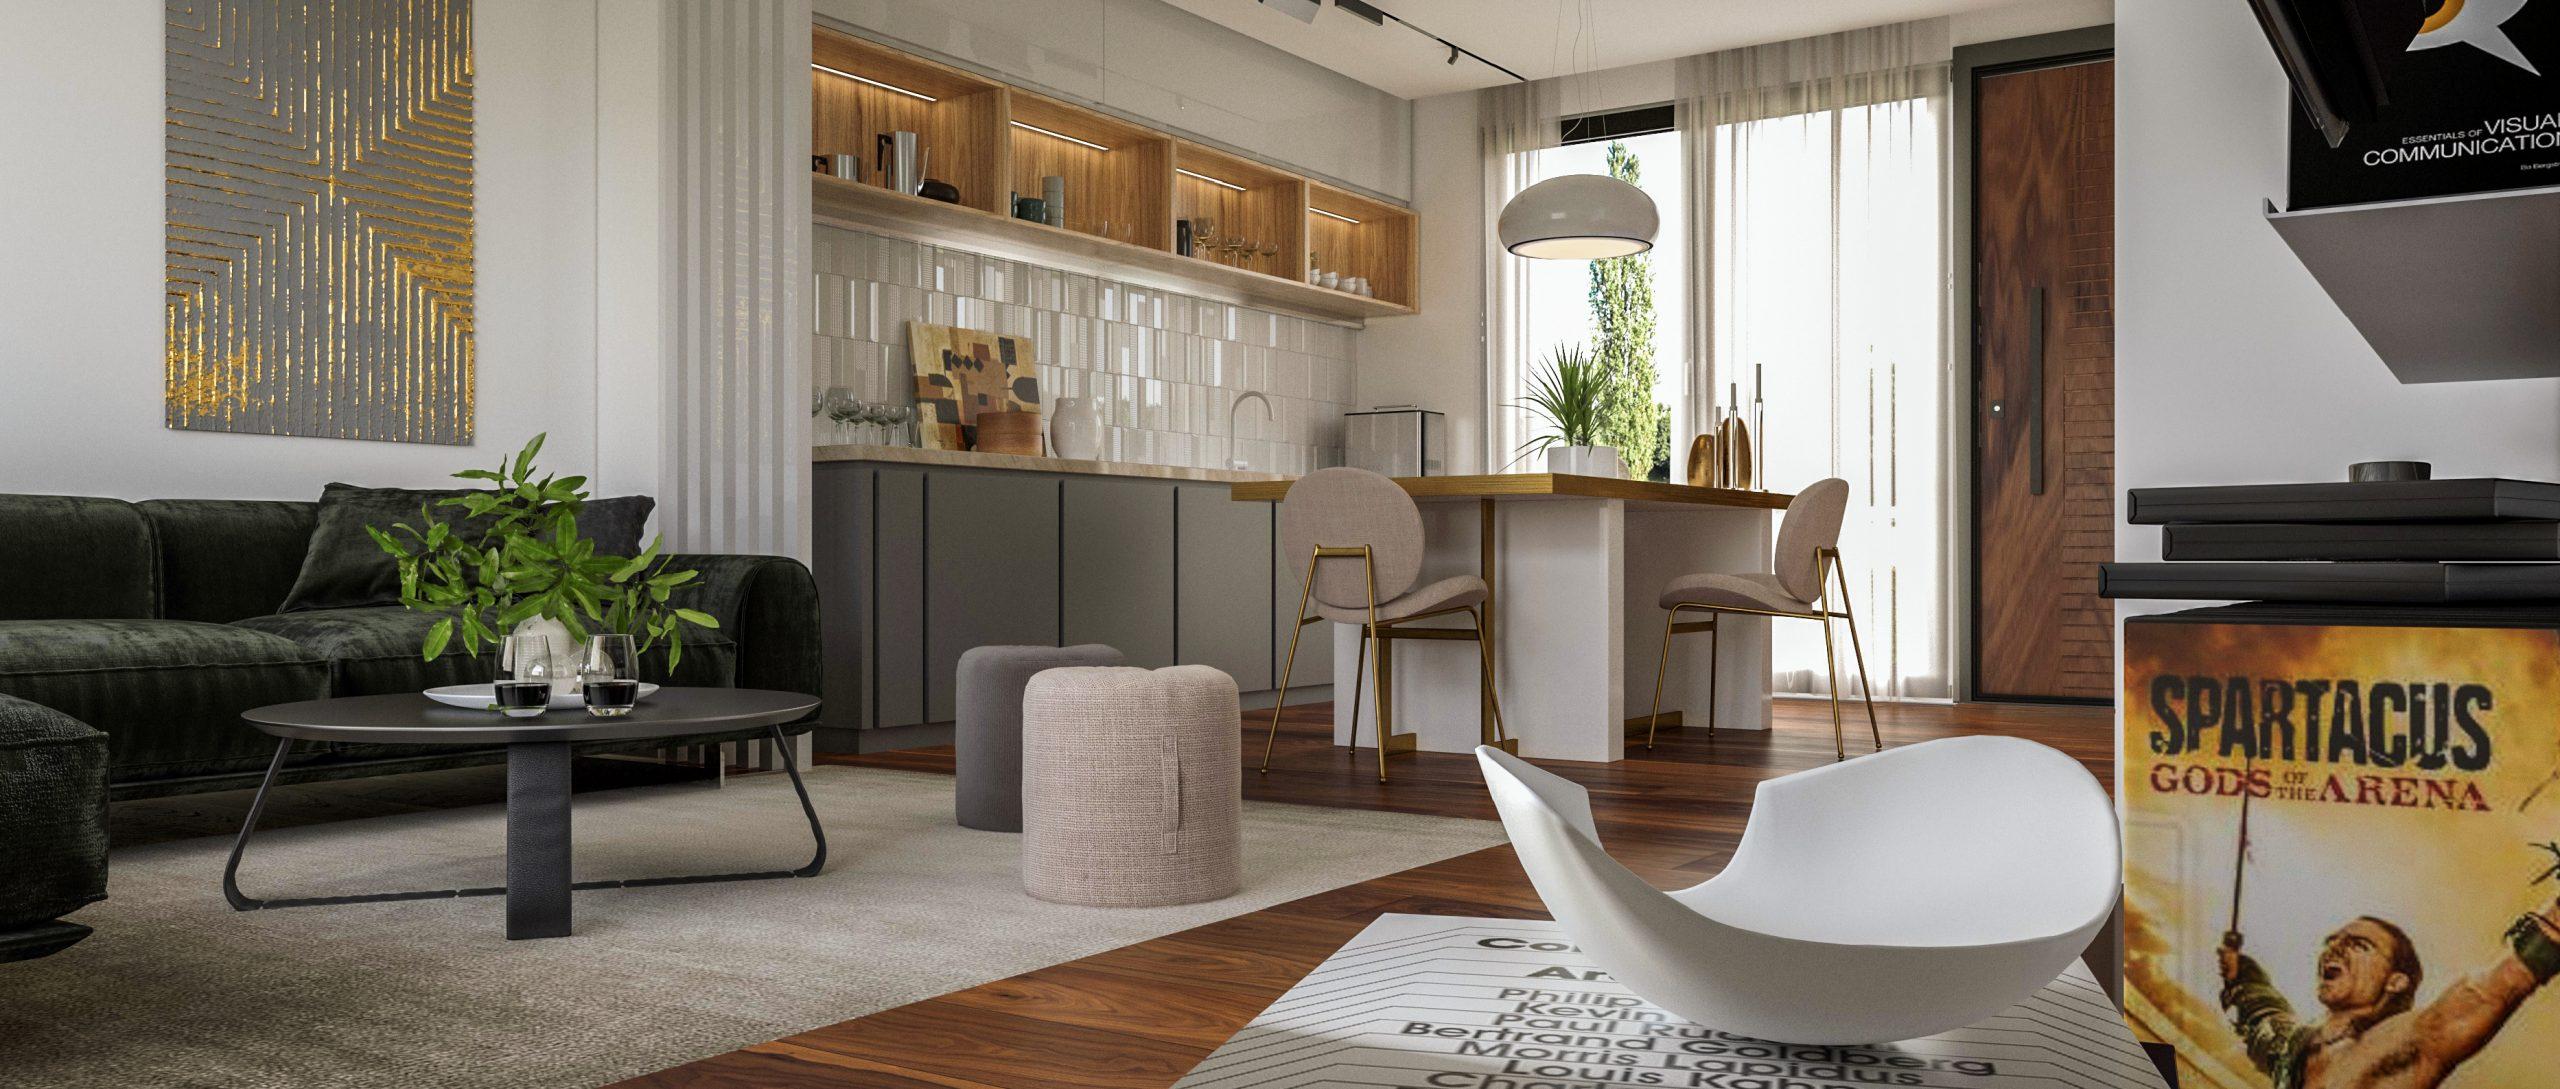 Nobil Residence_Apartament Et1+M_Dimieni-Tunari_ 3 camere_ap10